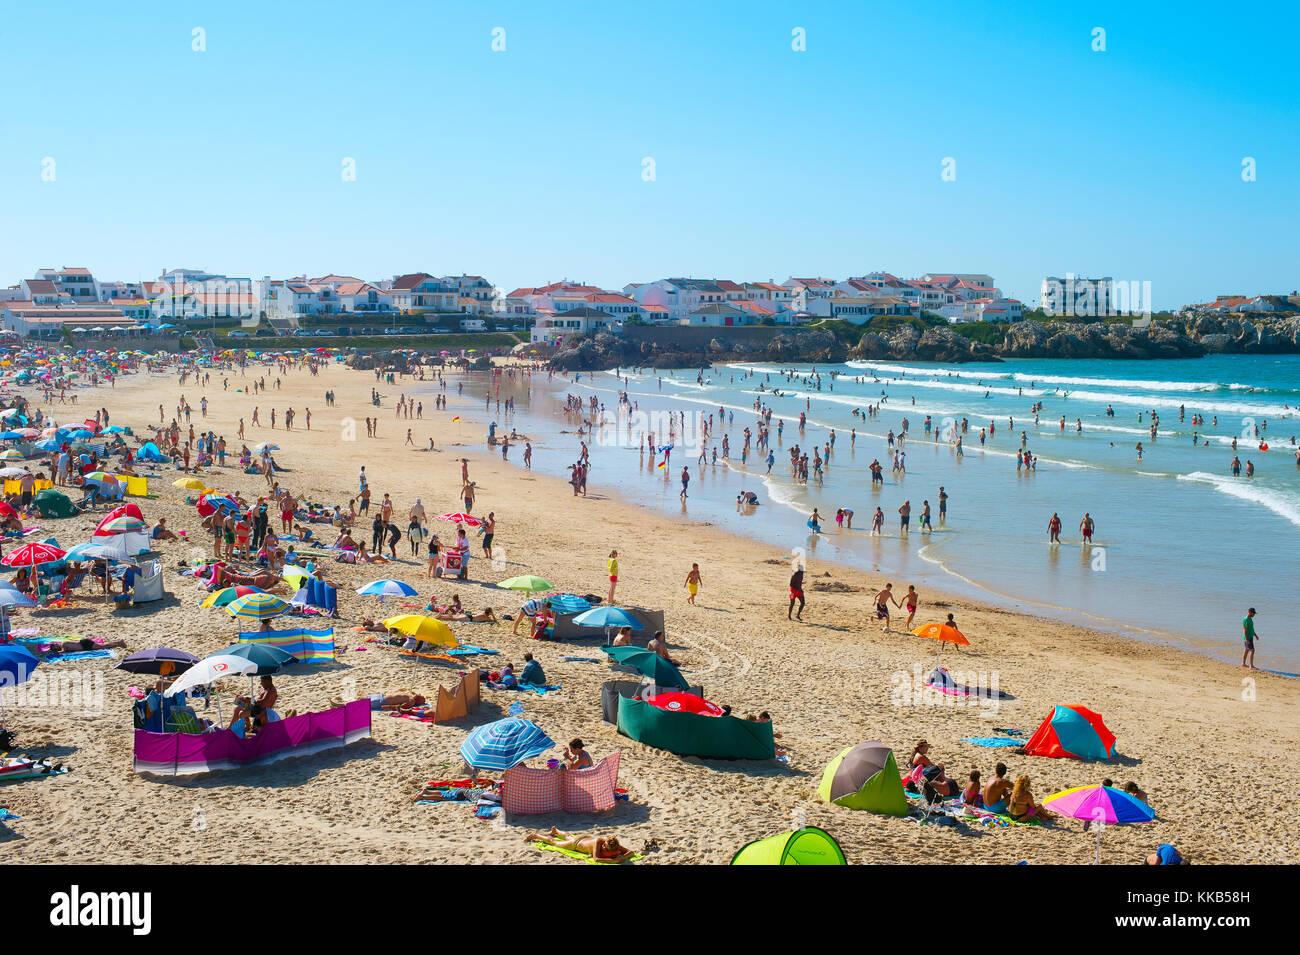 Baleal, Portugal - May 30, 2017: voll Ocean Beach in einer hohen Peak Season. Portugal berühmten Reiseziel Stockbild